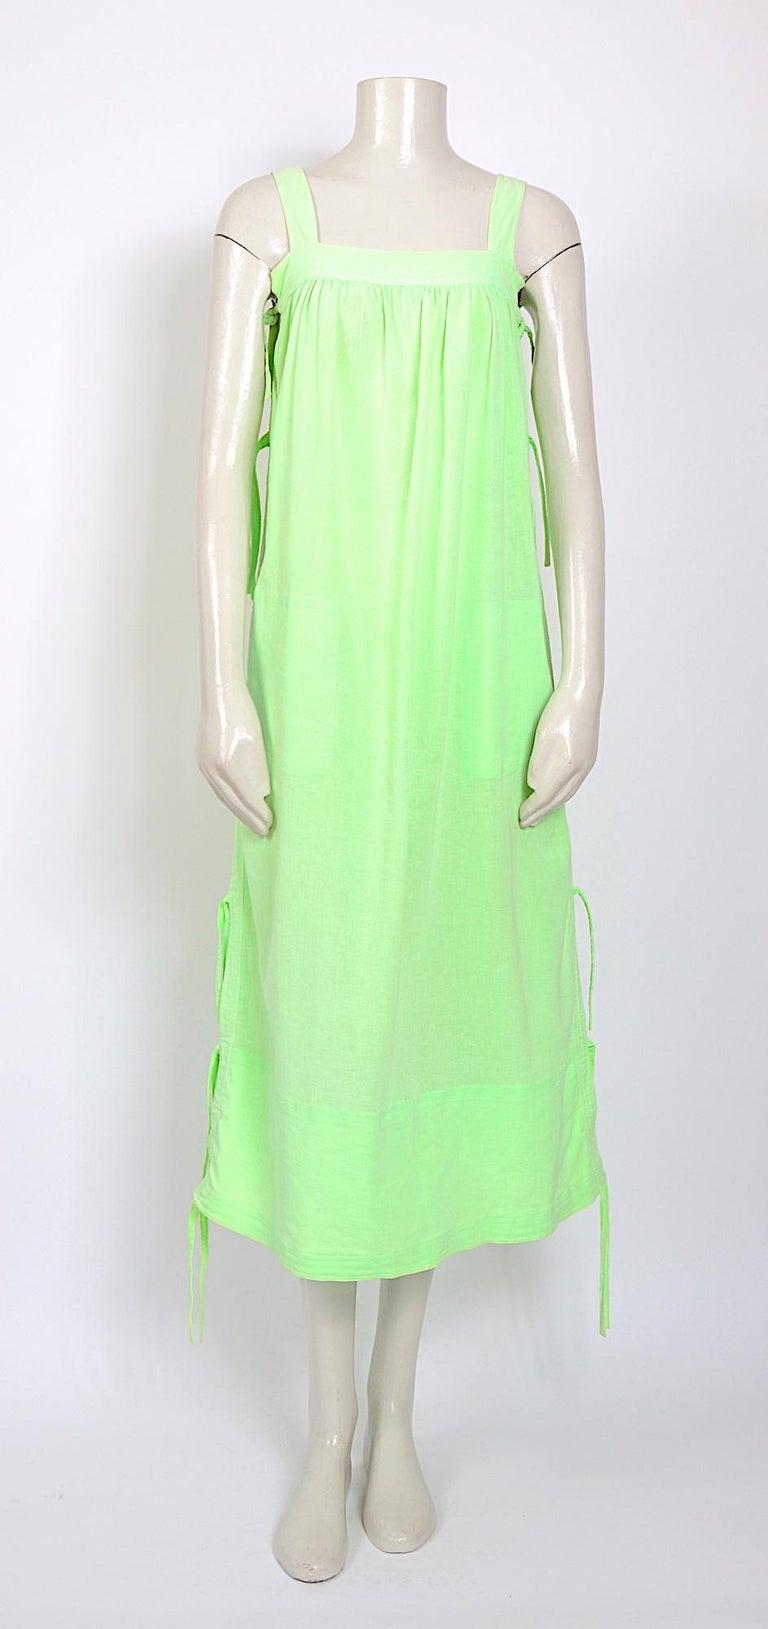 Andre Courreges vintage 1970s cotton bright lime green cotton linen summer dress  Courreges size 00 Measurements taken flat: Ua to Ua 16,5inch/42cm (x2)- Waist 25inch/64cm(x2) - Total length with strap 48inch/122cm